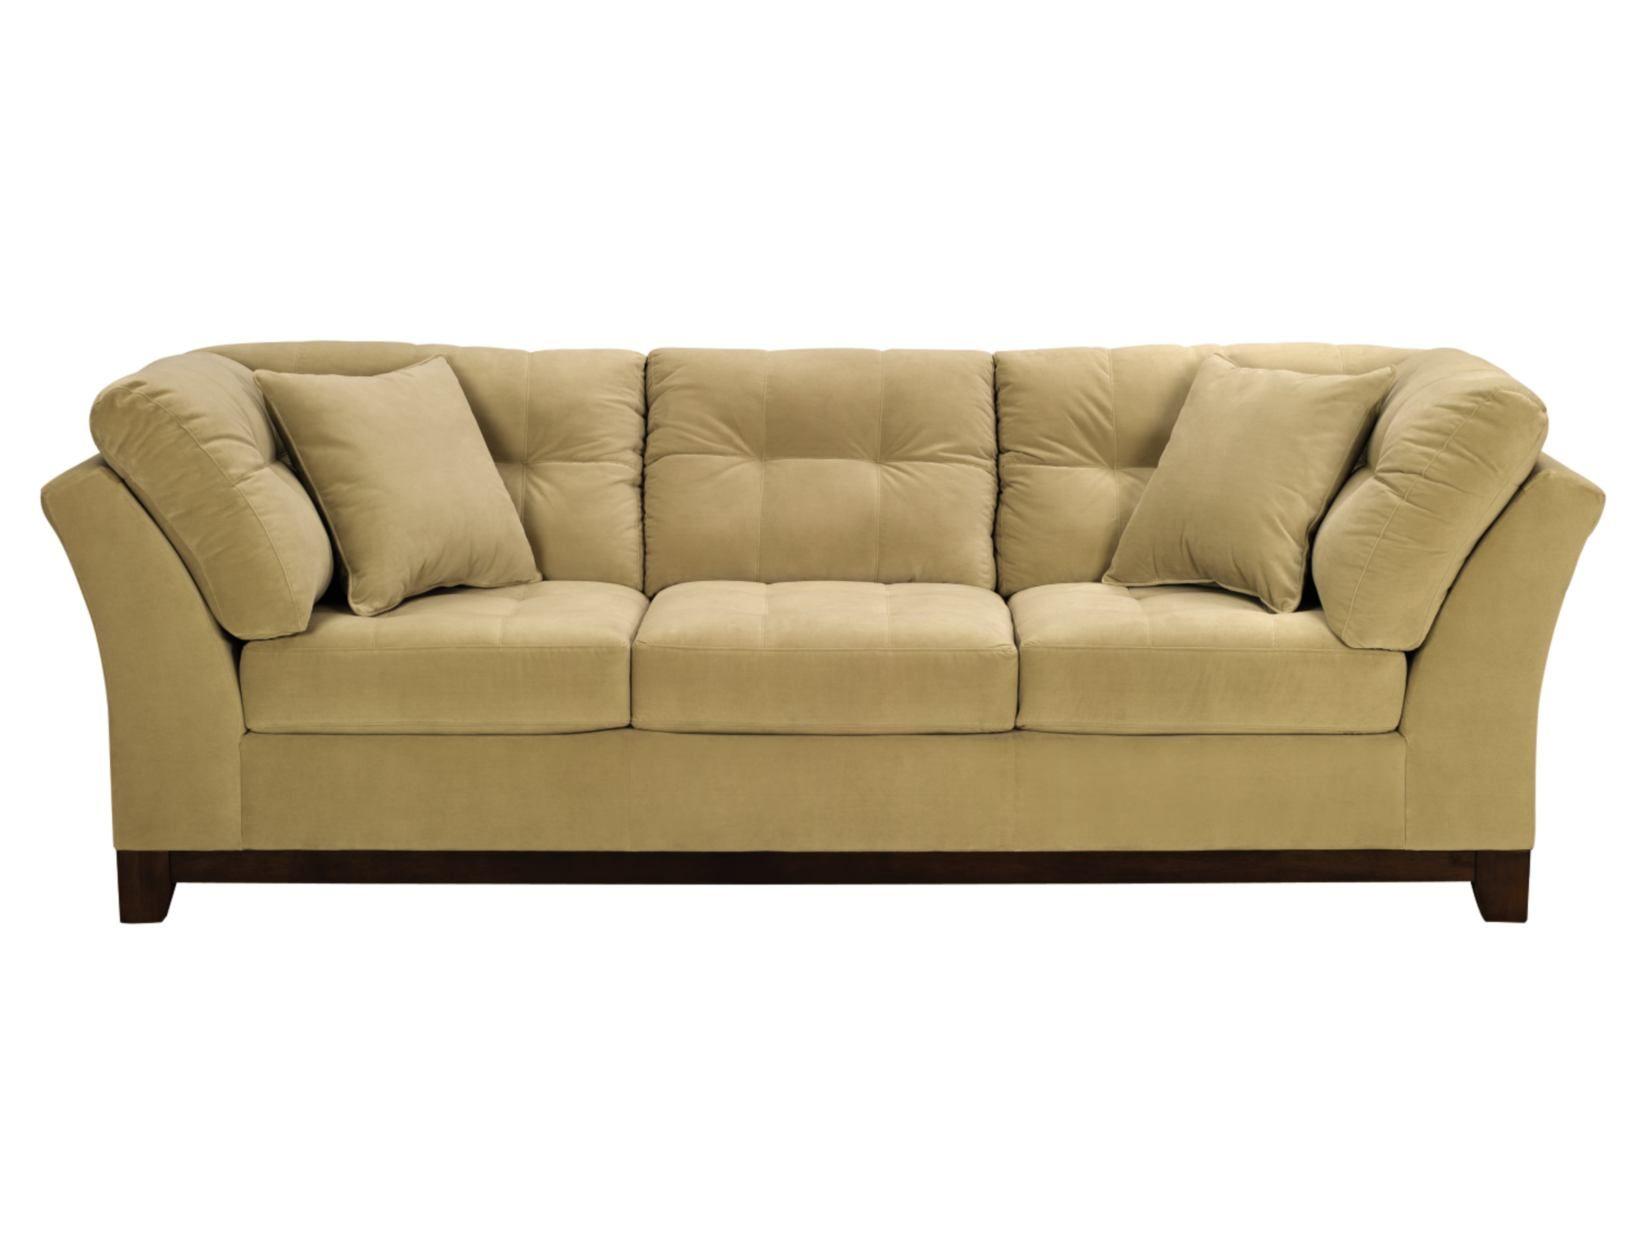 Solace Stone Sofa Value City Furniture Decorative Shtuffff Pinterest City Furniture